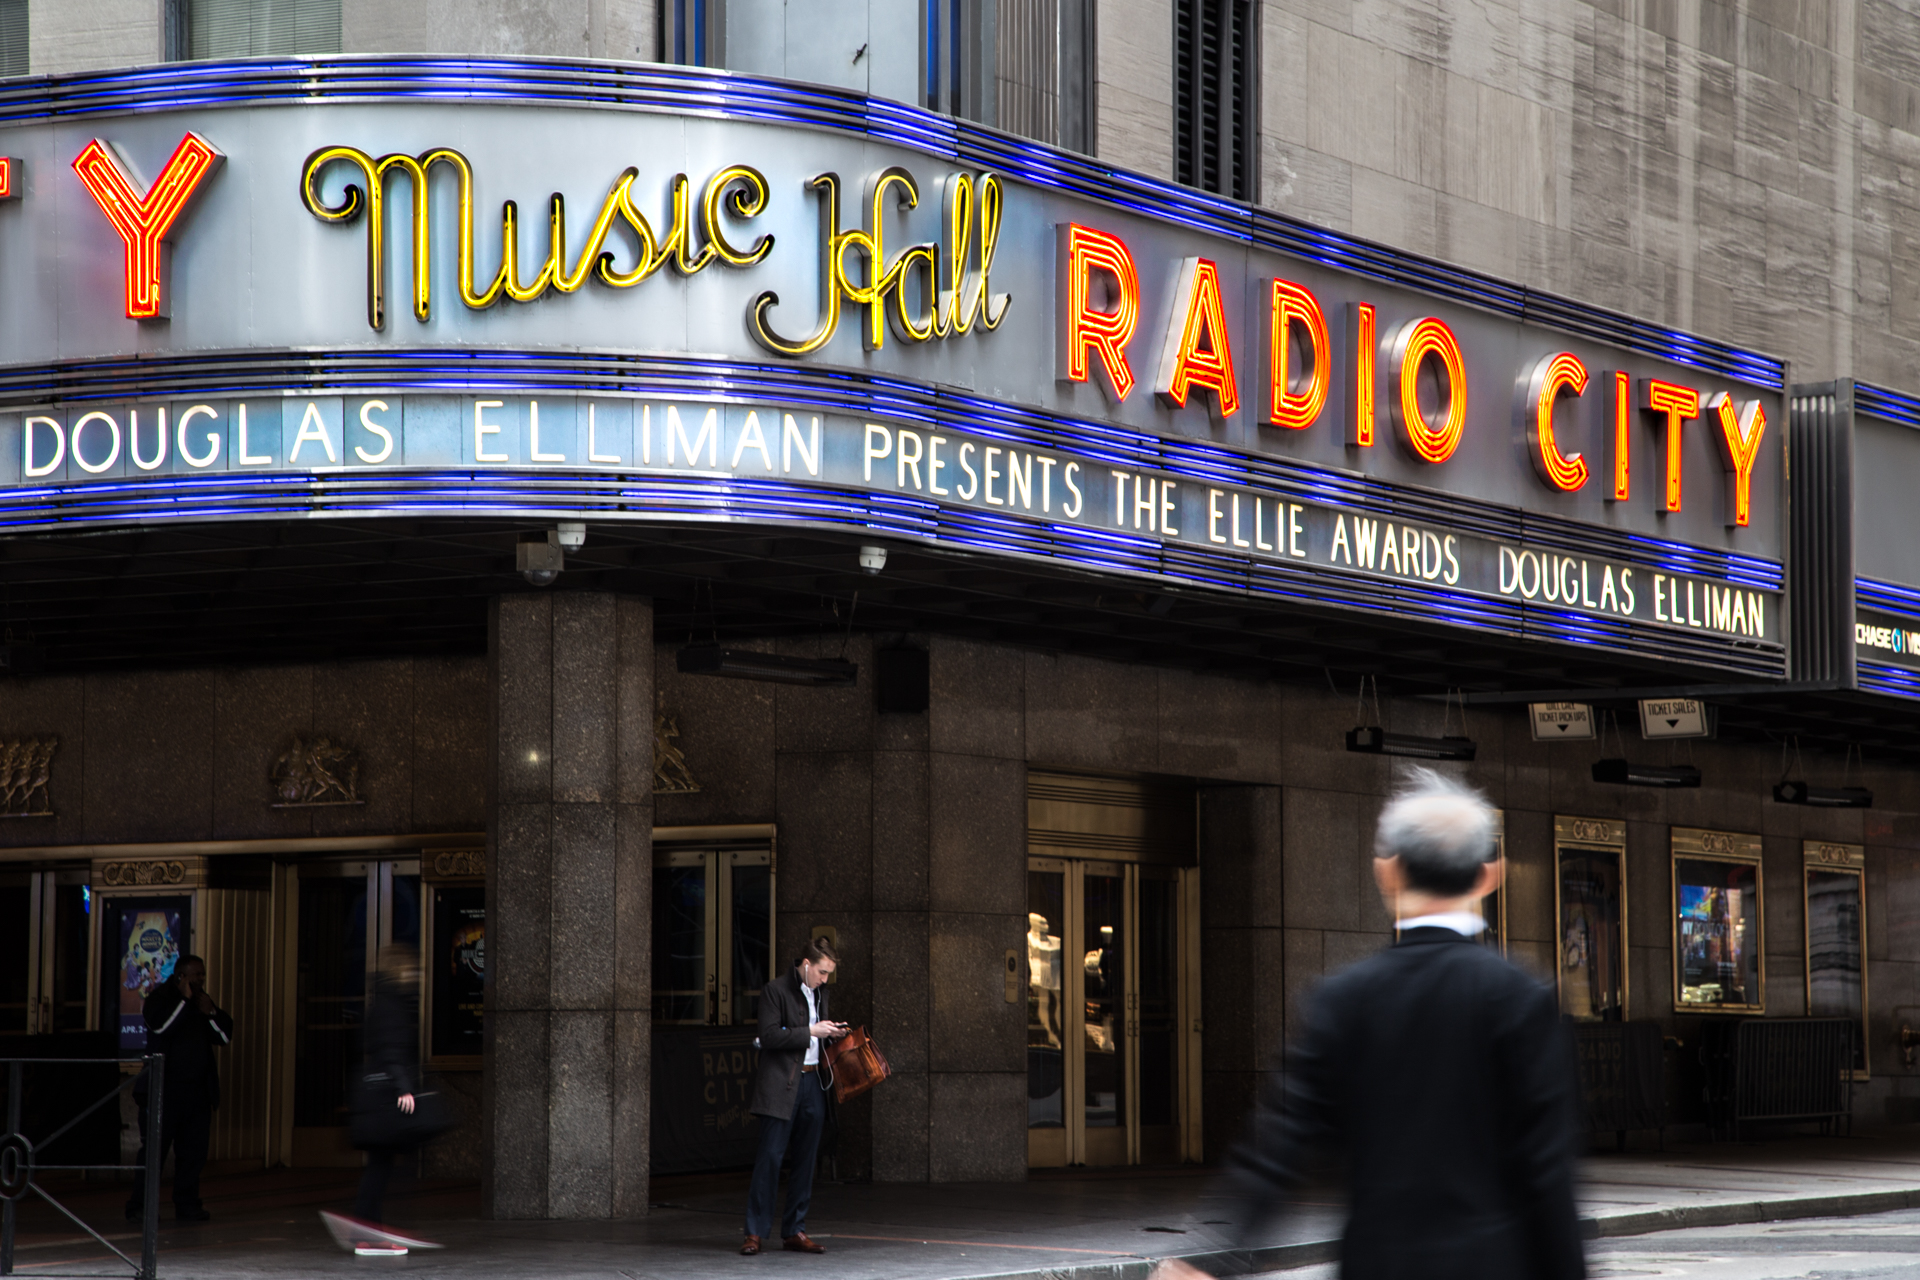 Ellies Radio City Music Hall